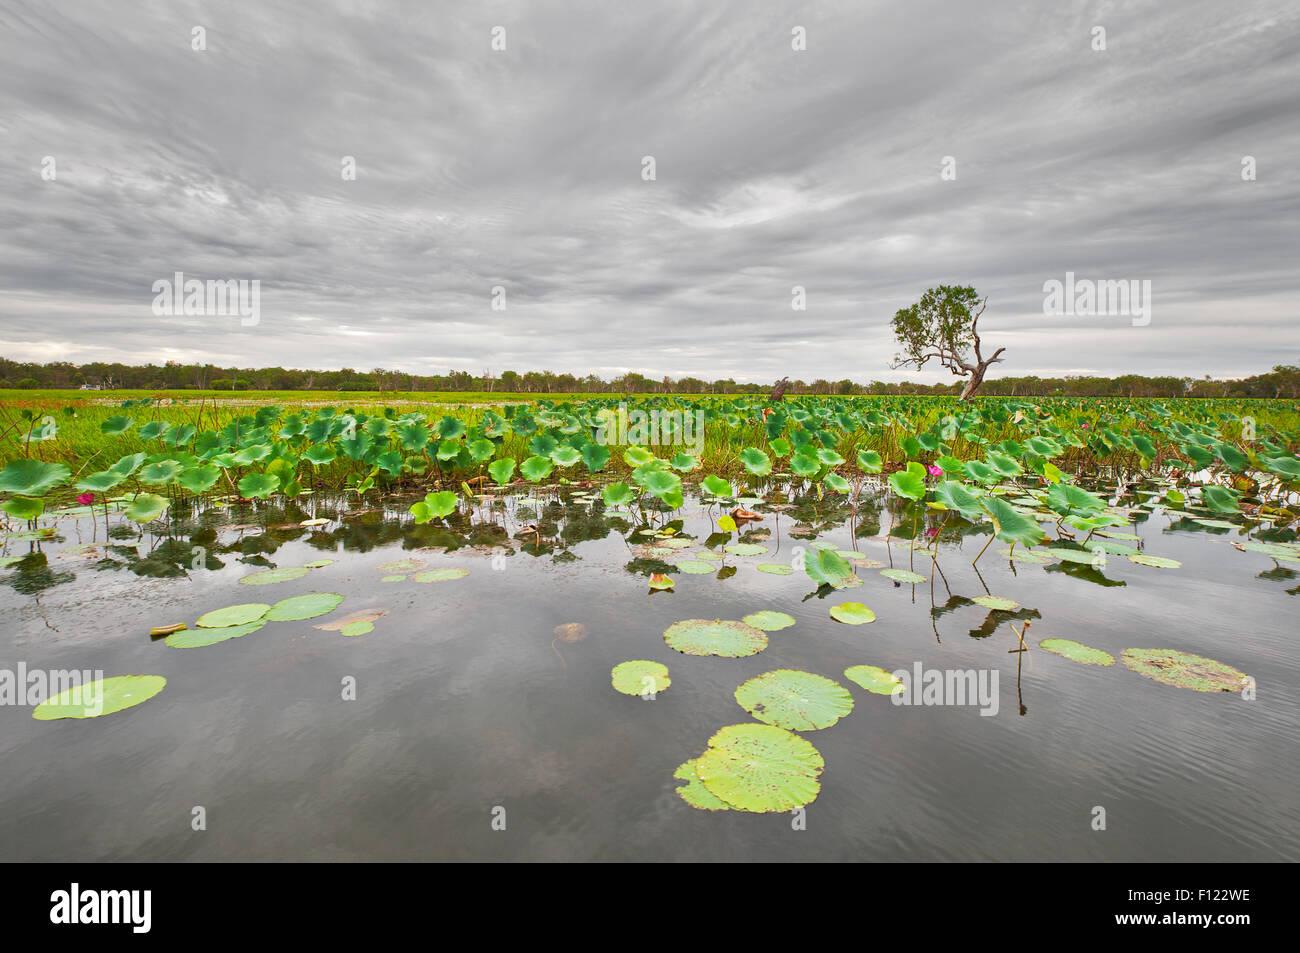 Water Lilies sul Fiume South Alligator nel Parco Nazionale Kakadu. Foto Stock